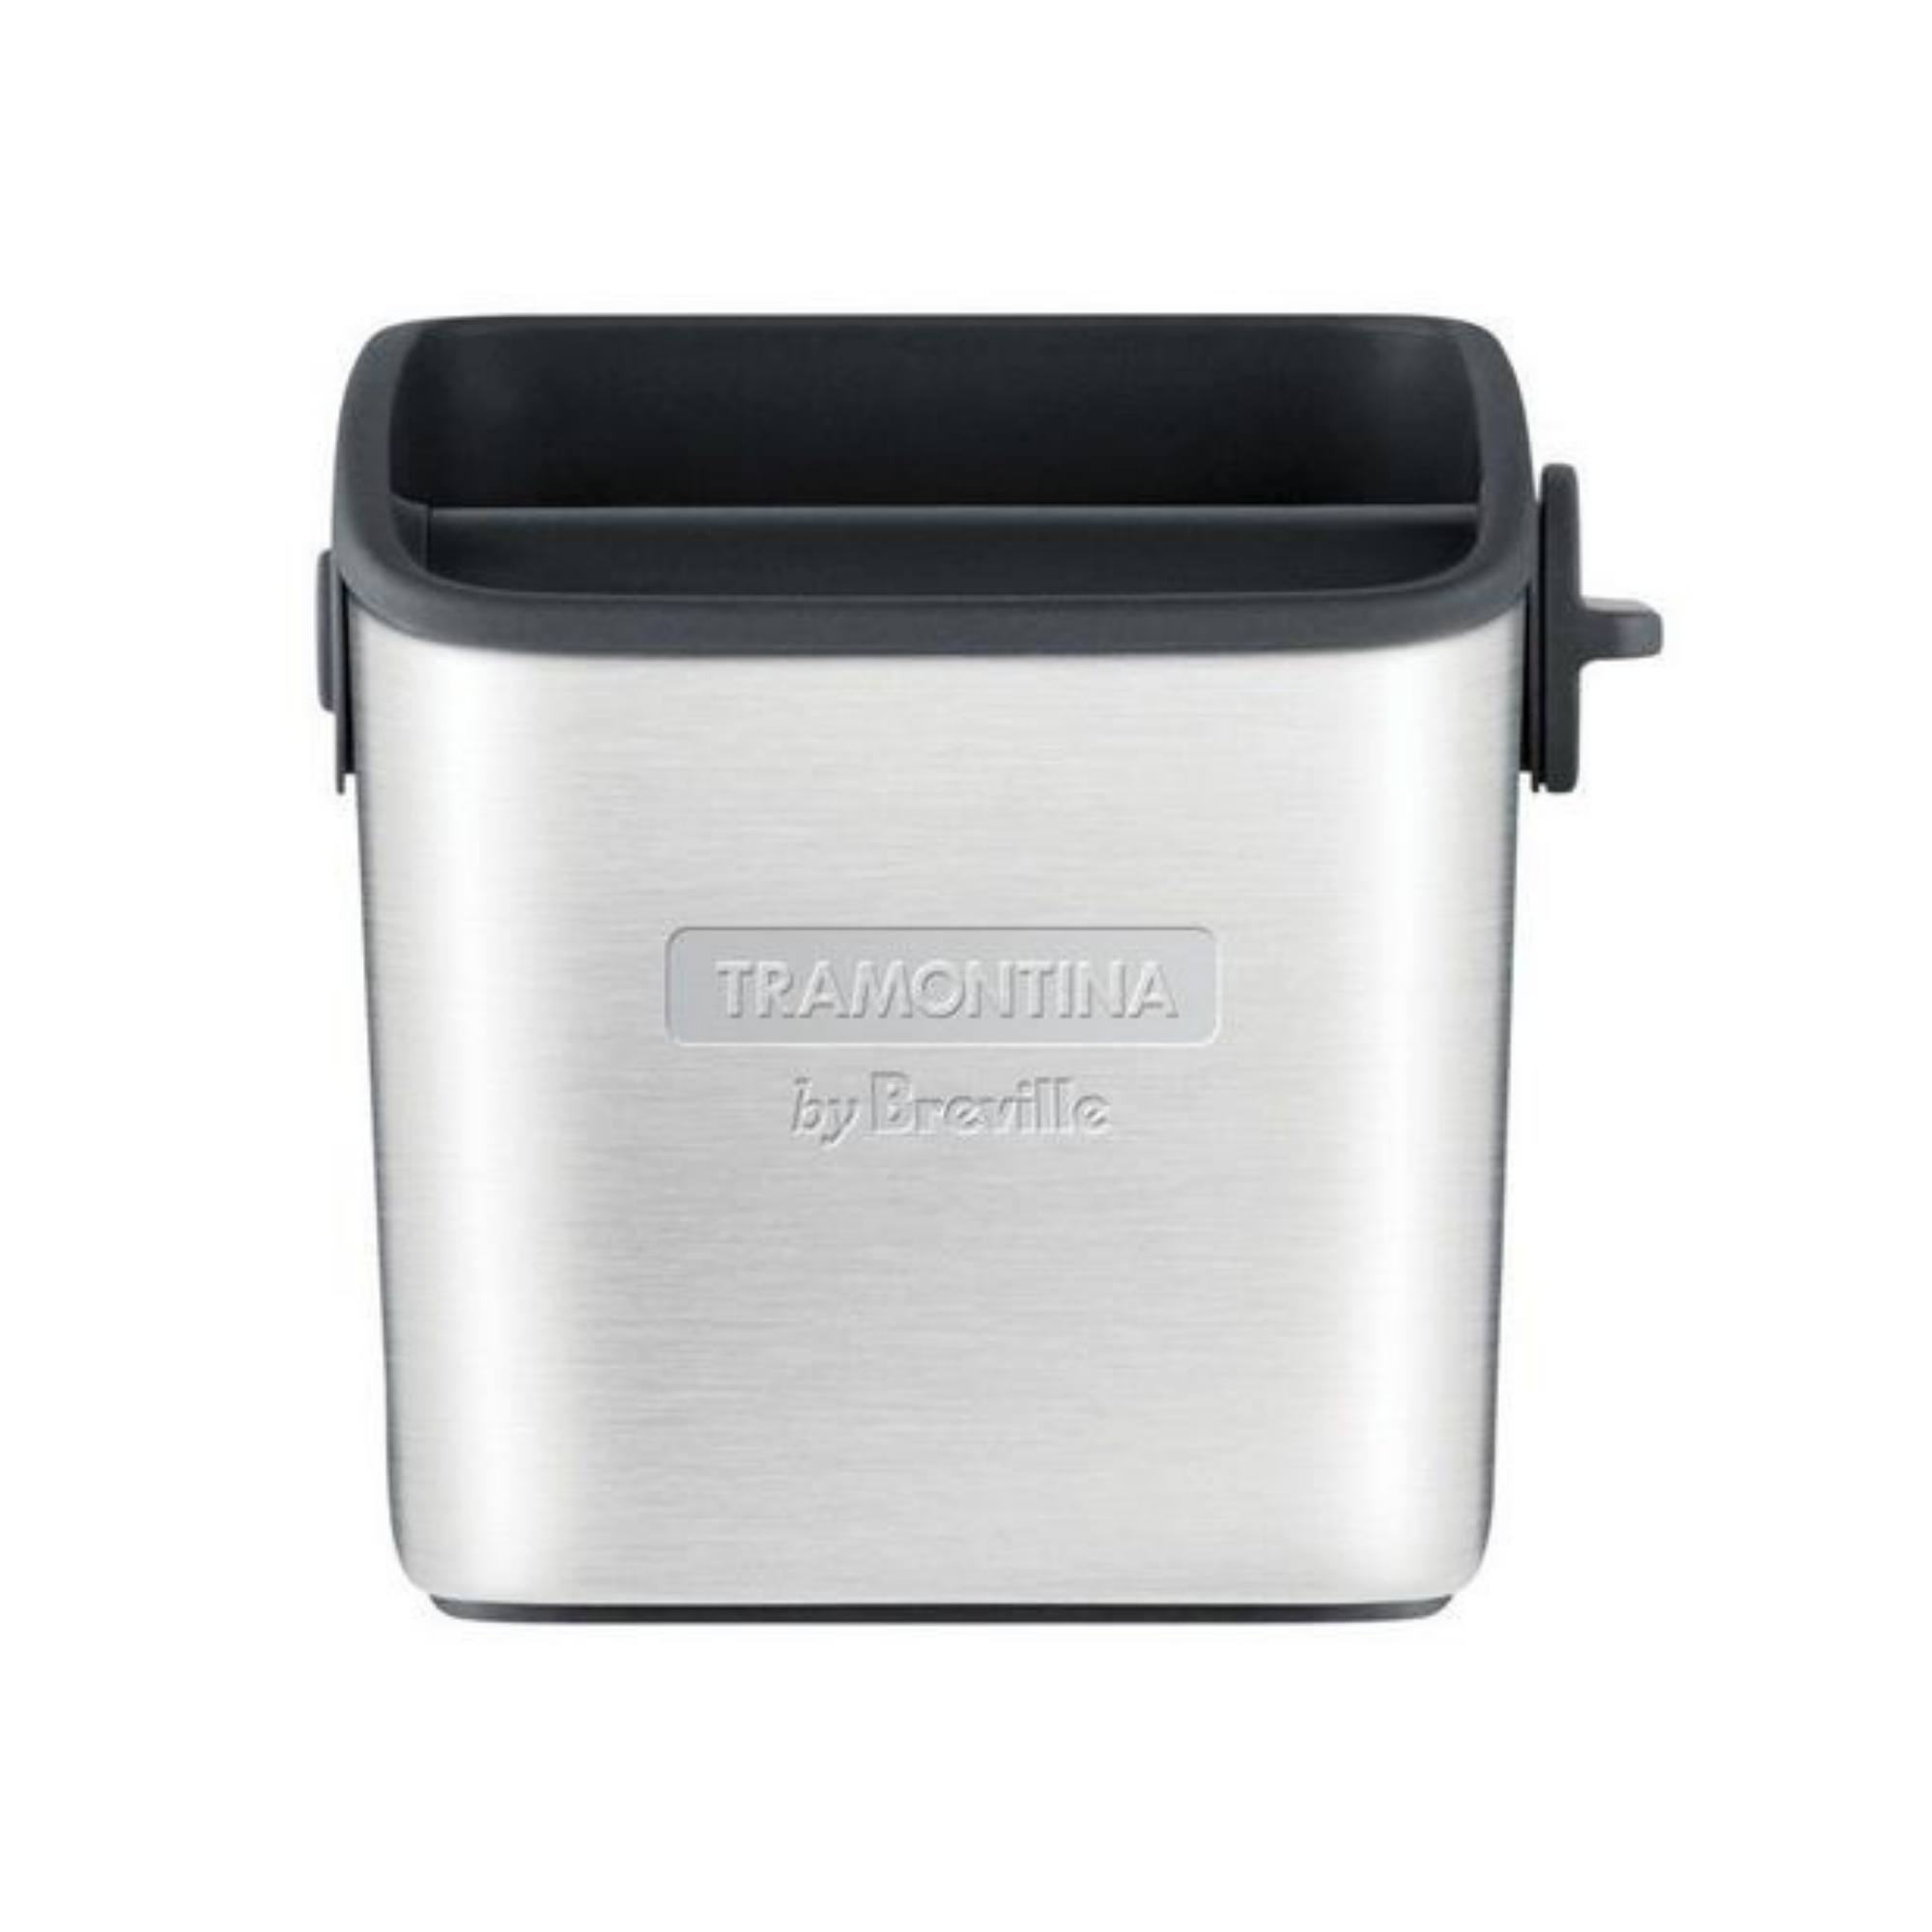 Coletor De Borra Café Tramontina By Breville Aço Inox 0,5 L